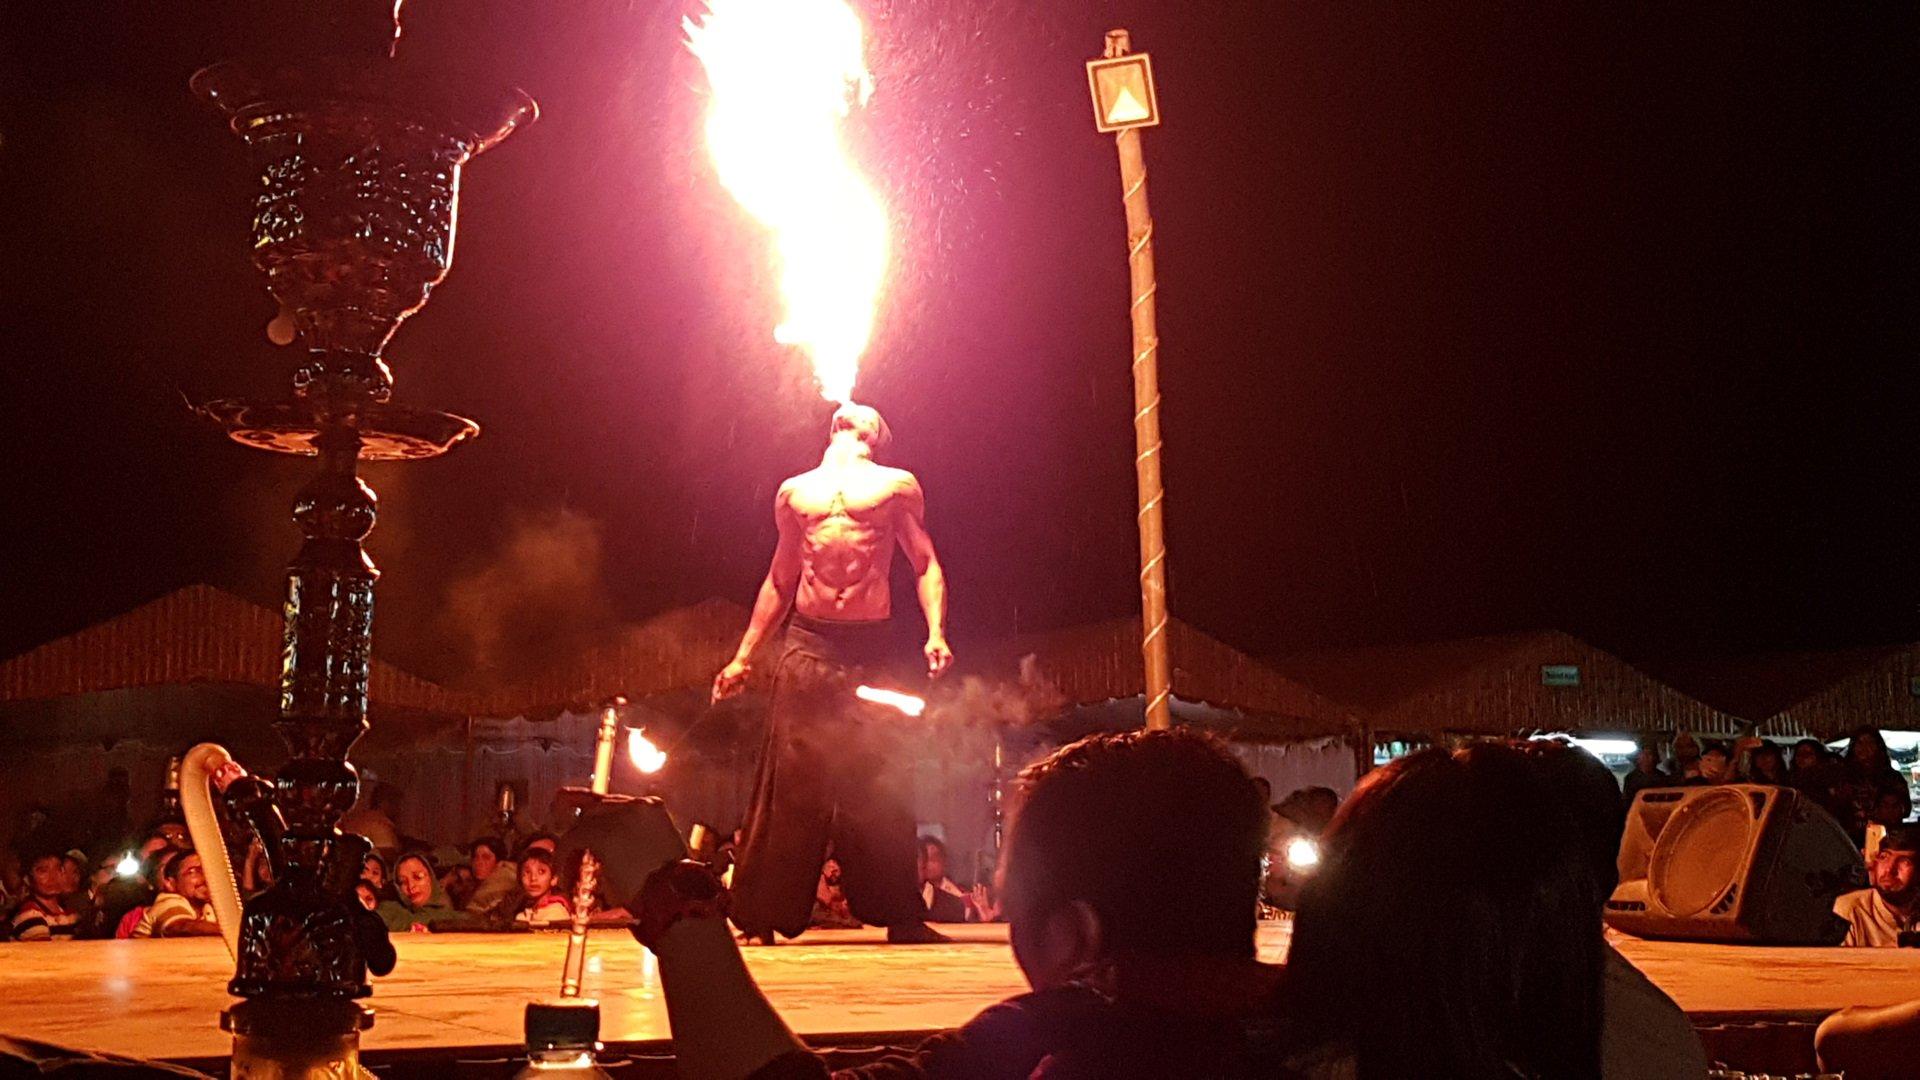 book-dubai-deset-safari-with-belly-dance-show-best-offers-in-dubai